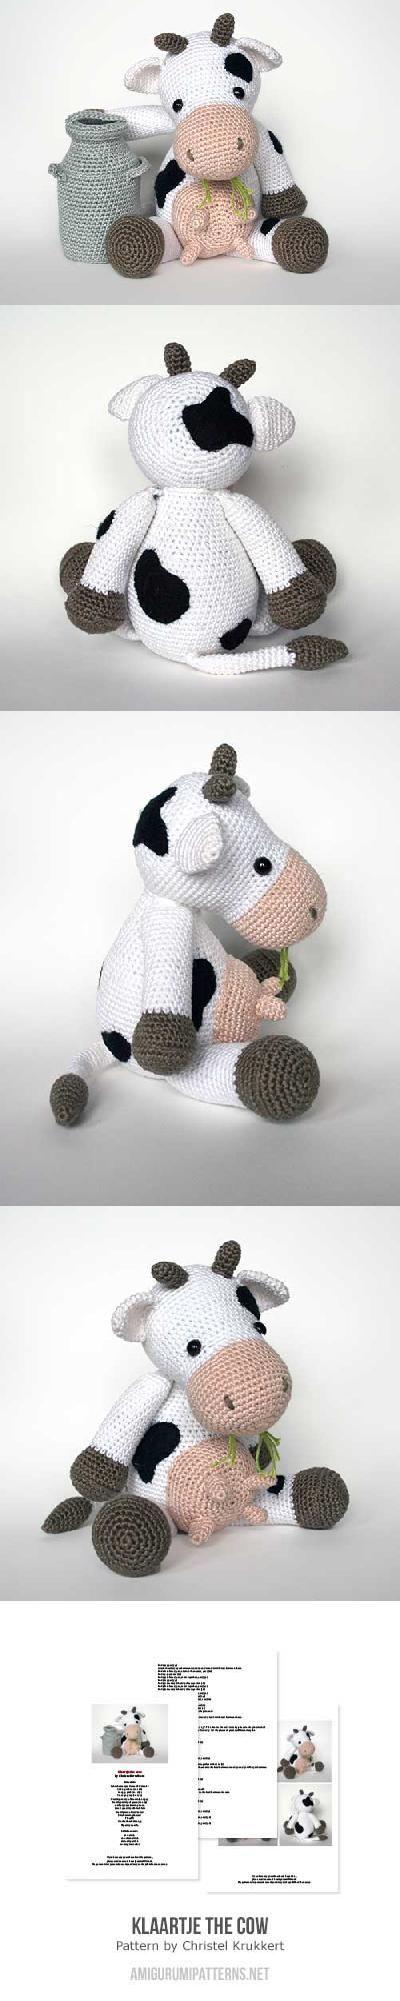 Klaartje The Cow Amigurumi Pattern More